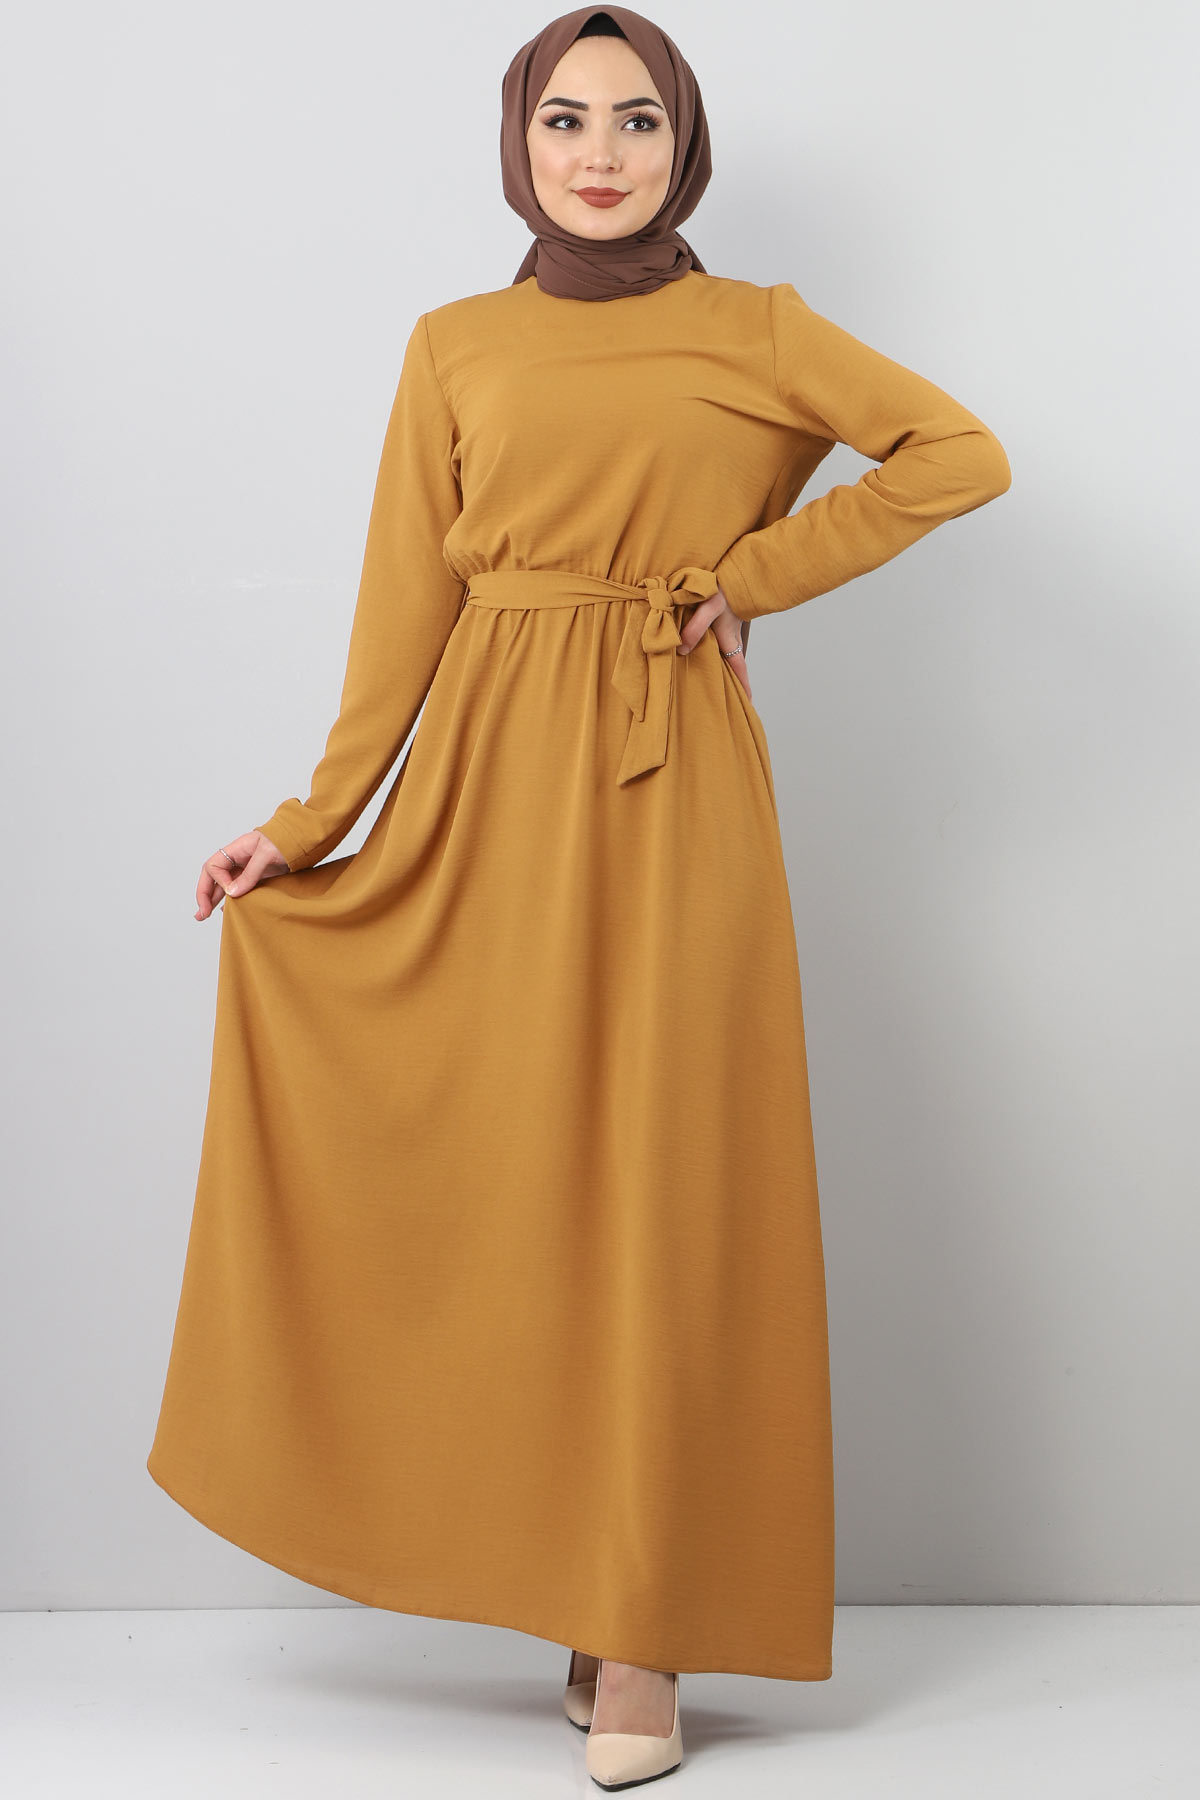 Elastic Waist Ayrobin Dress TSD5521 Mustard